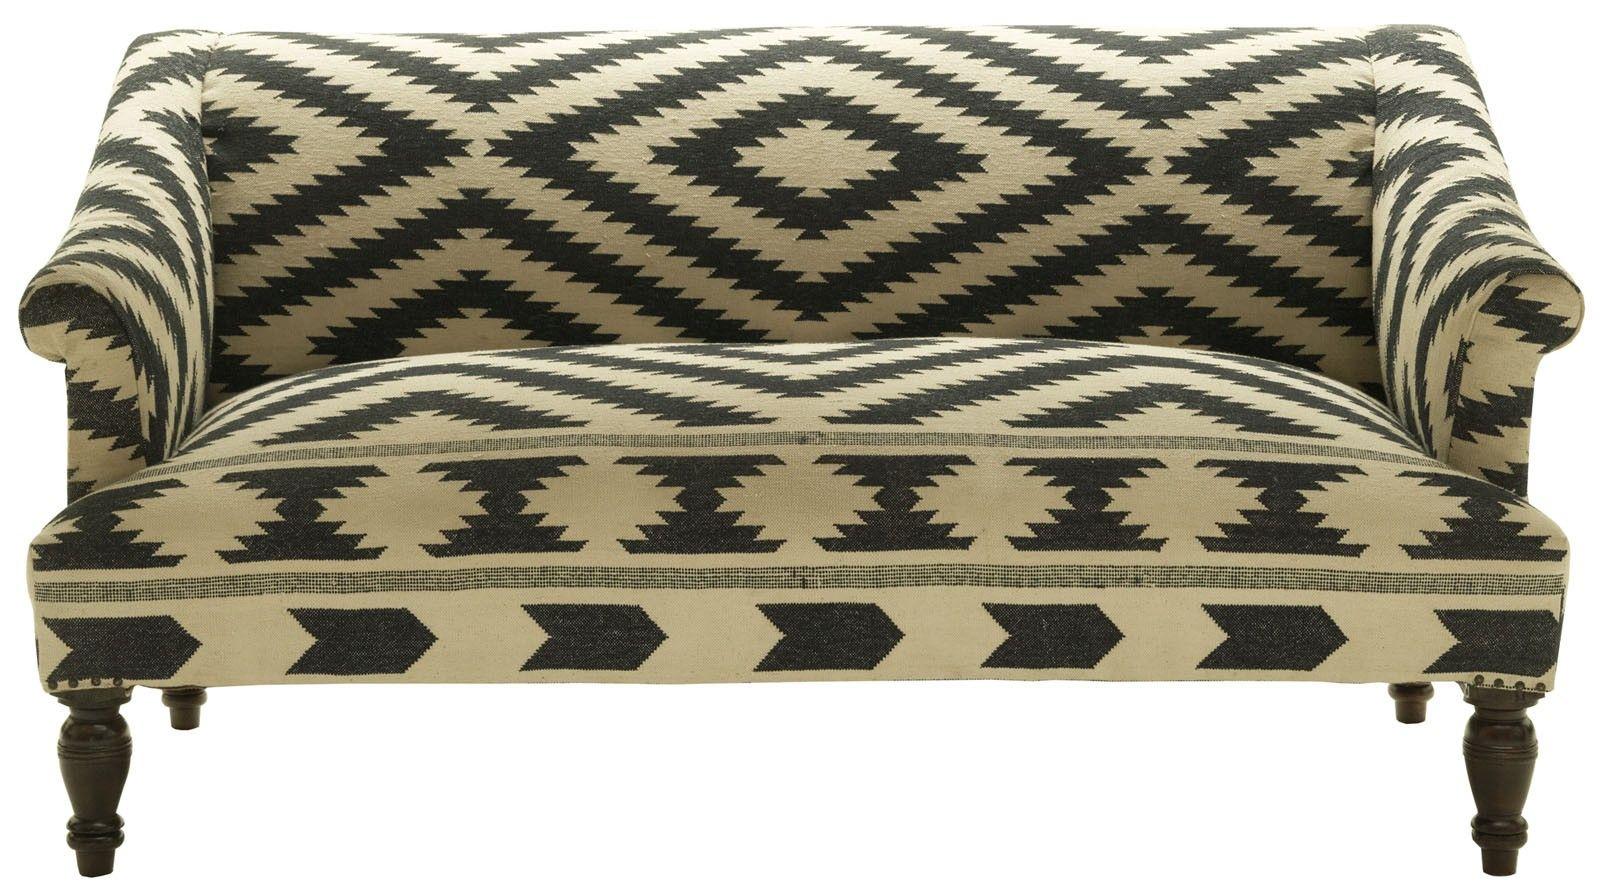 Outstanding Kilim Sofa Black White Geometric Patterns Black White Bralicious Painted Fabric Chair Ideas Braliciousco